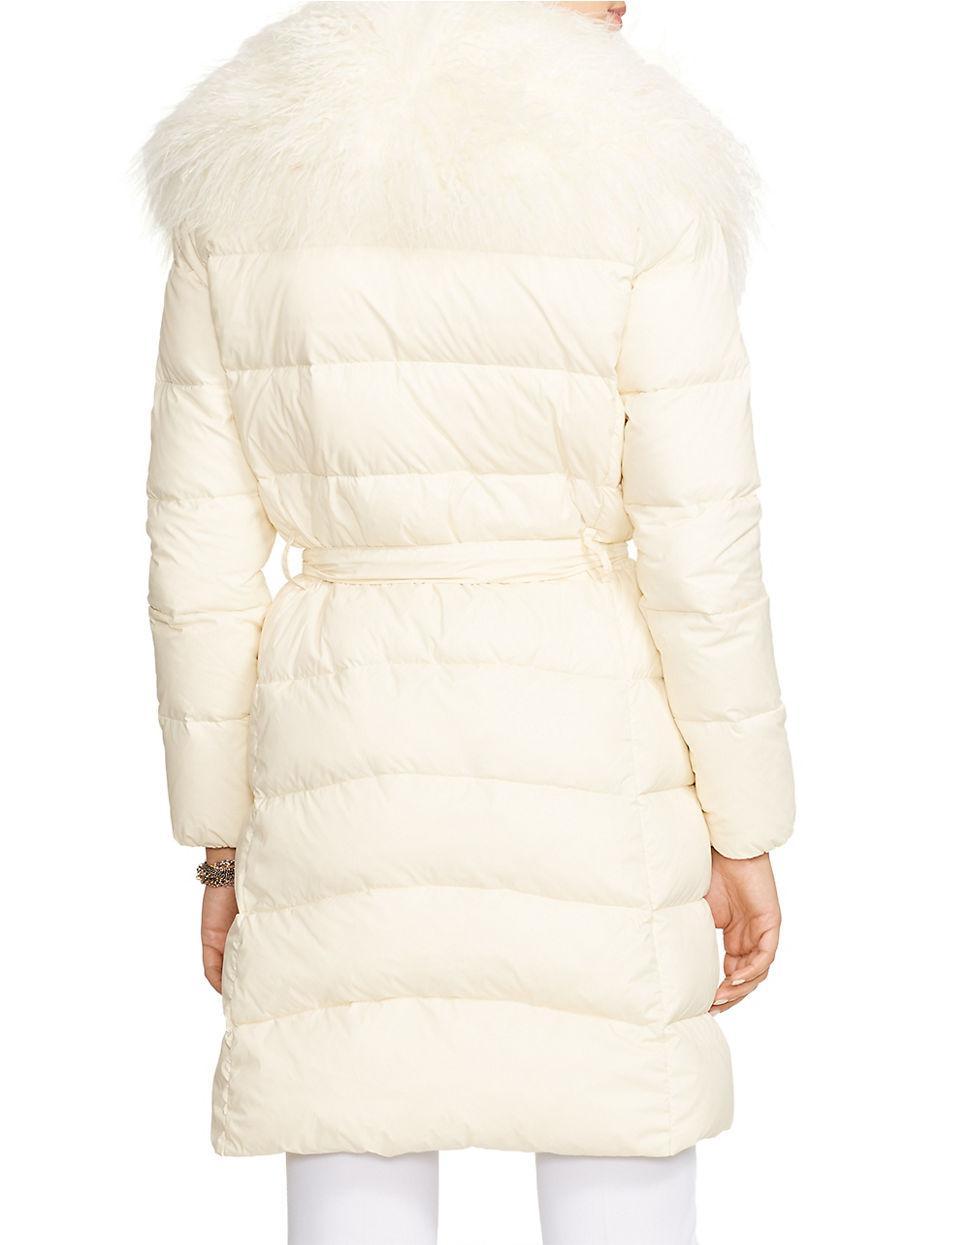 Lyst - Lauren By Ralph Lauren Petite Quilted Faux Fur ...